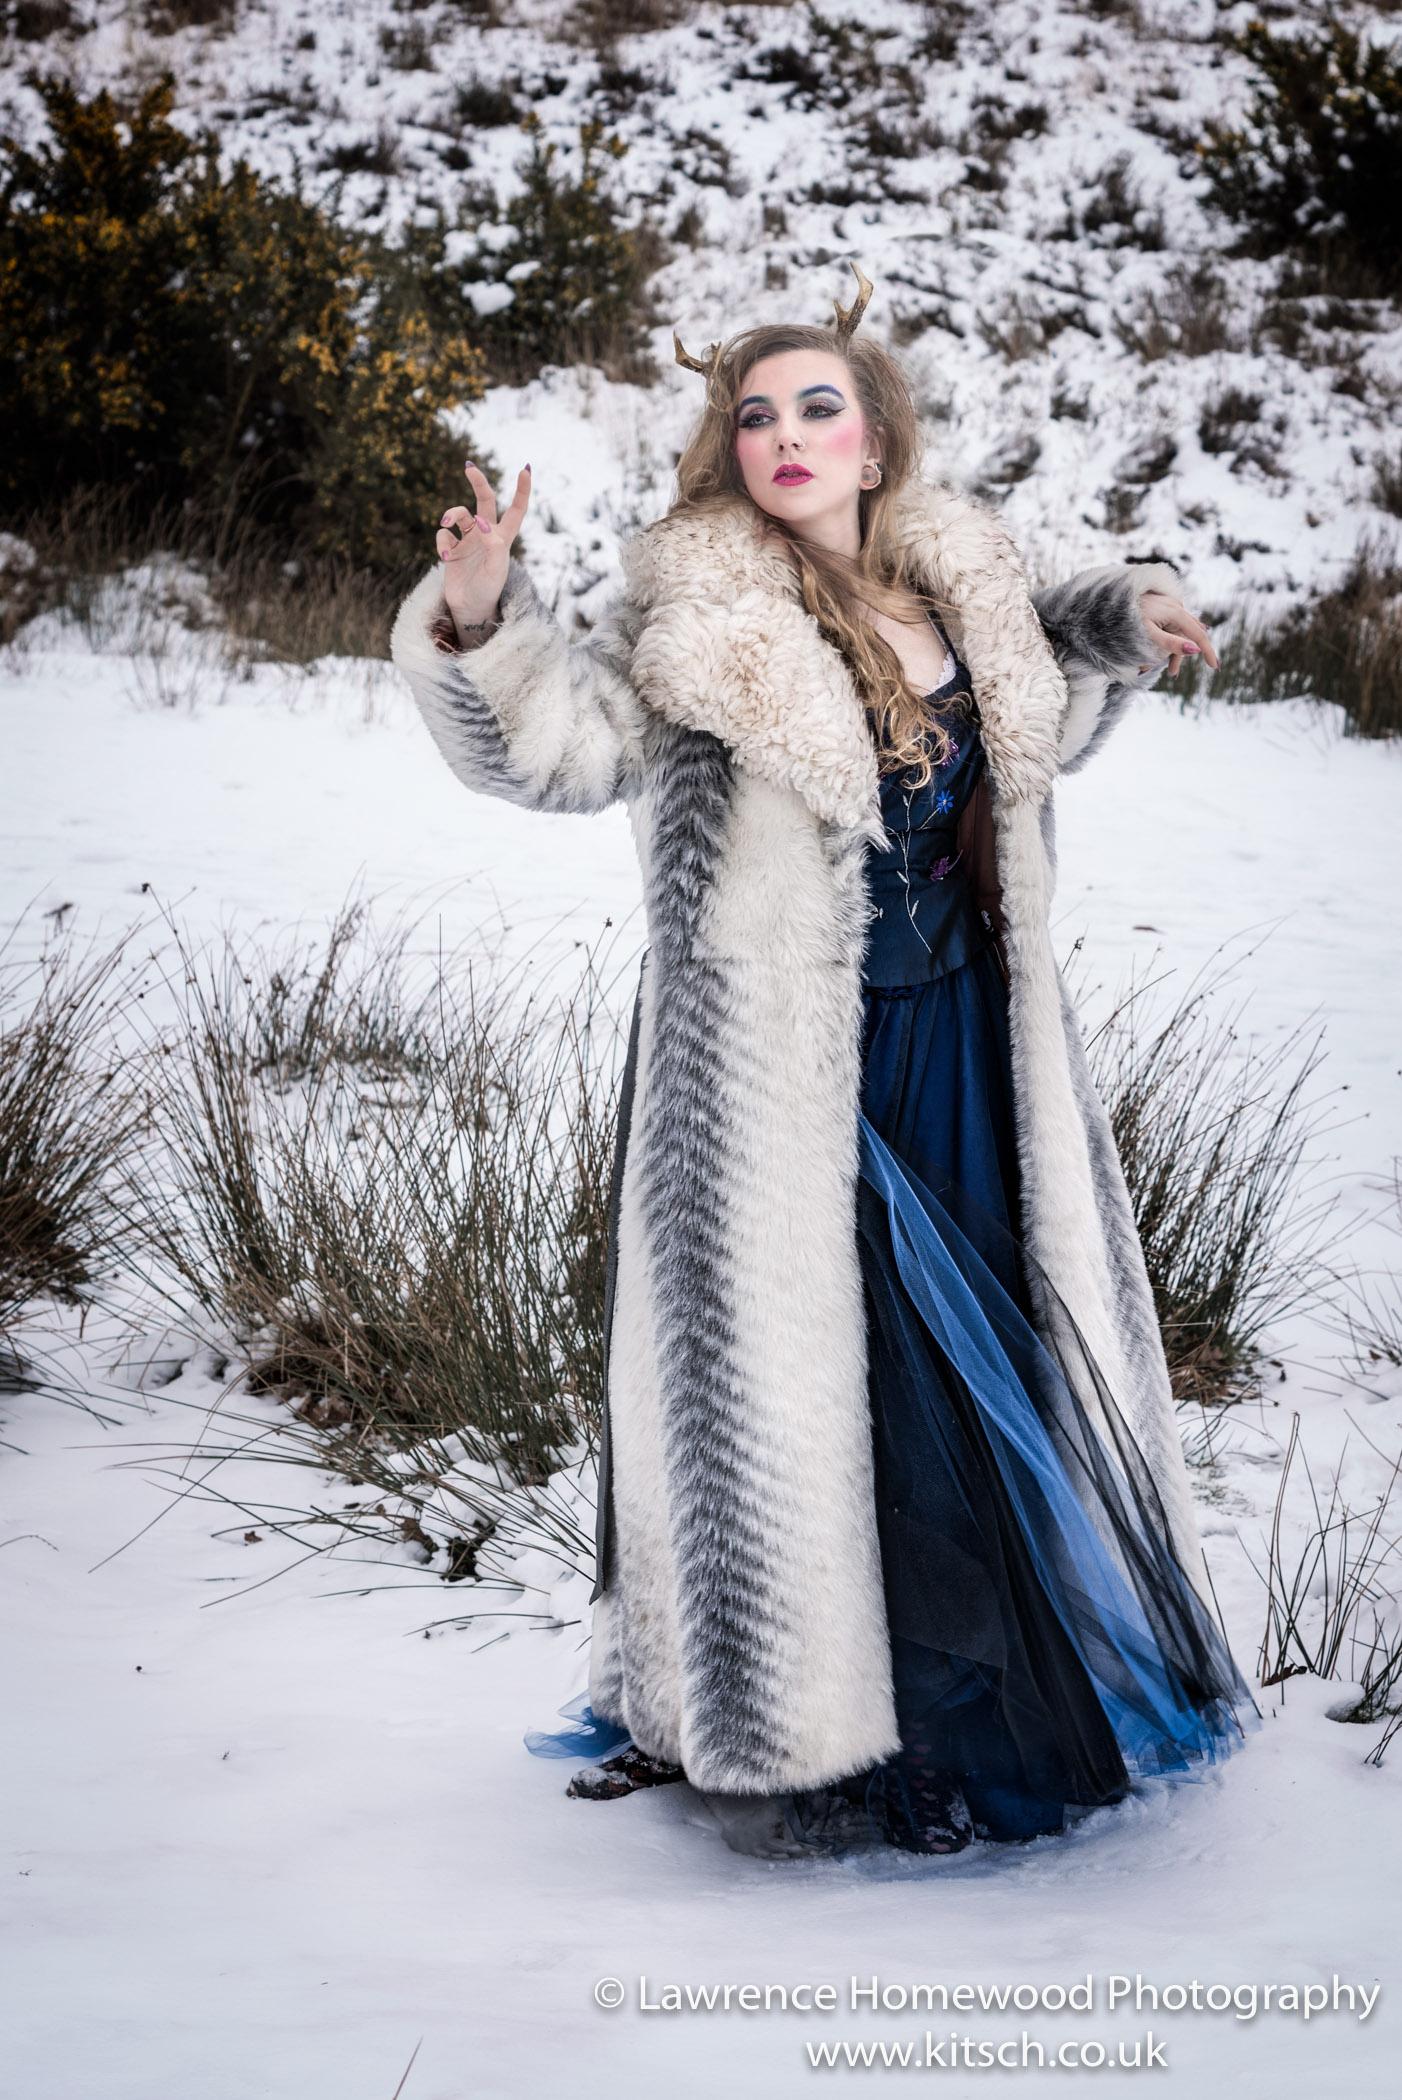 Fawn Princess - A Winters Tale09